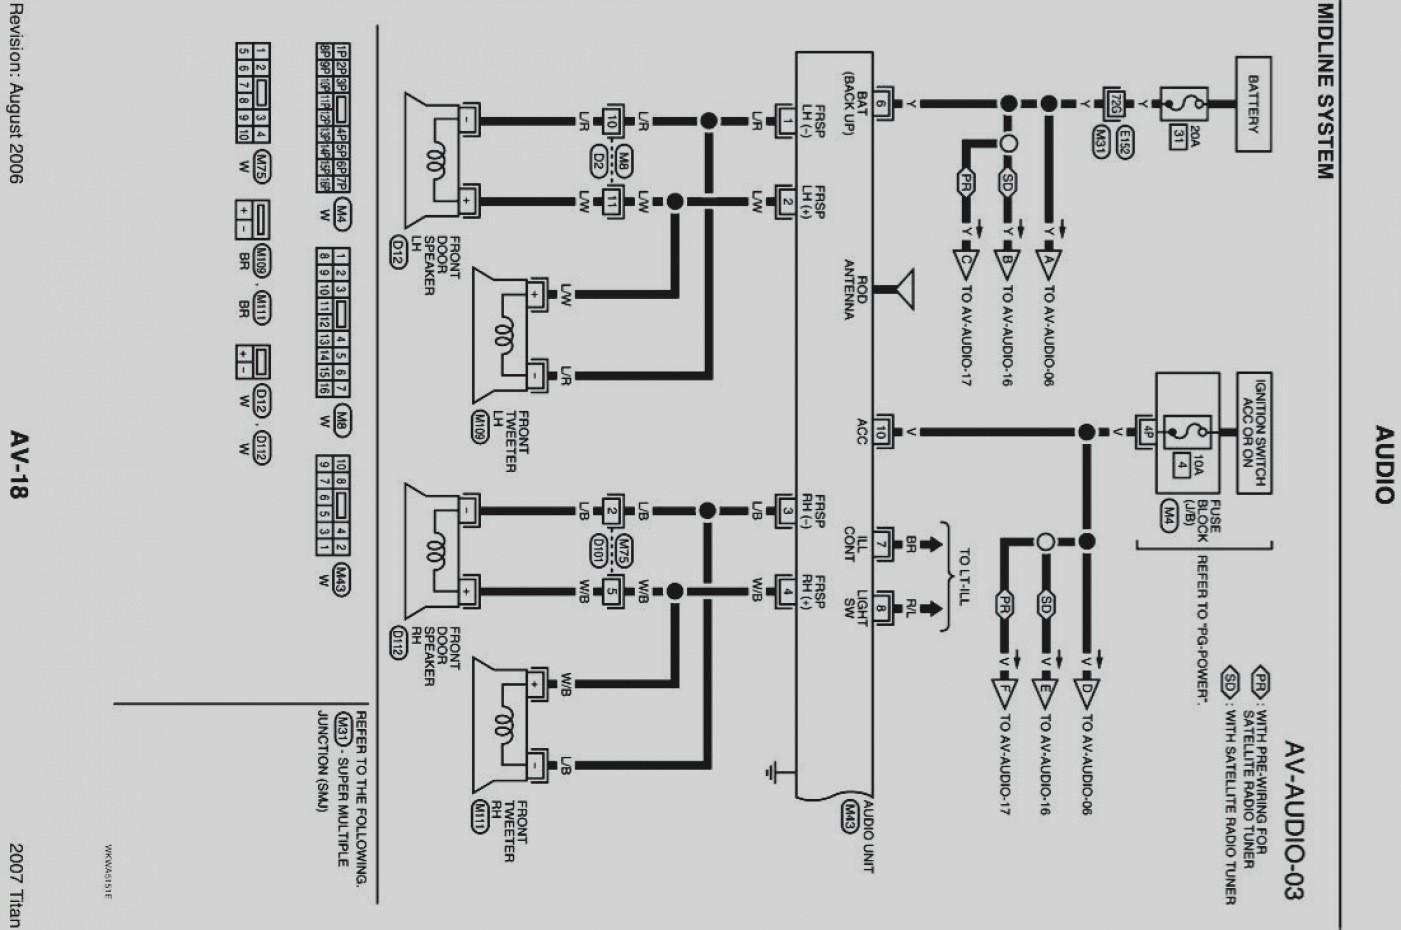 nissan titan wiring harness diagram great design of wiring diagram u2022 rh  homewerk co